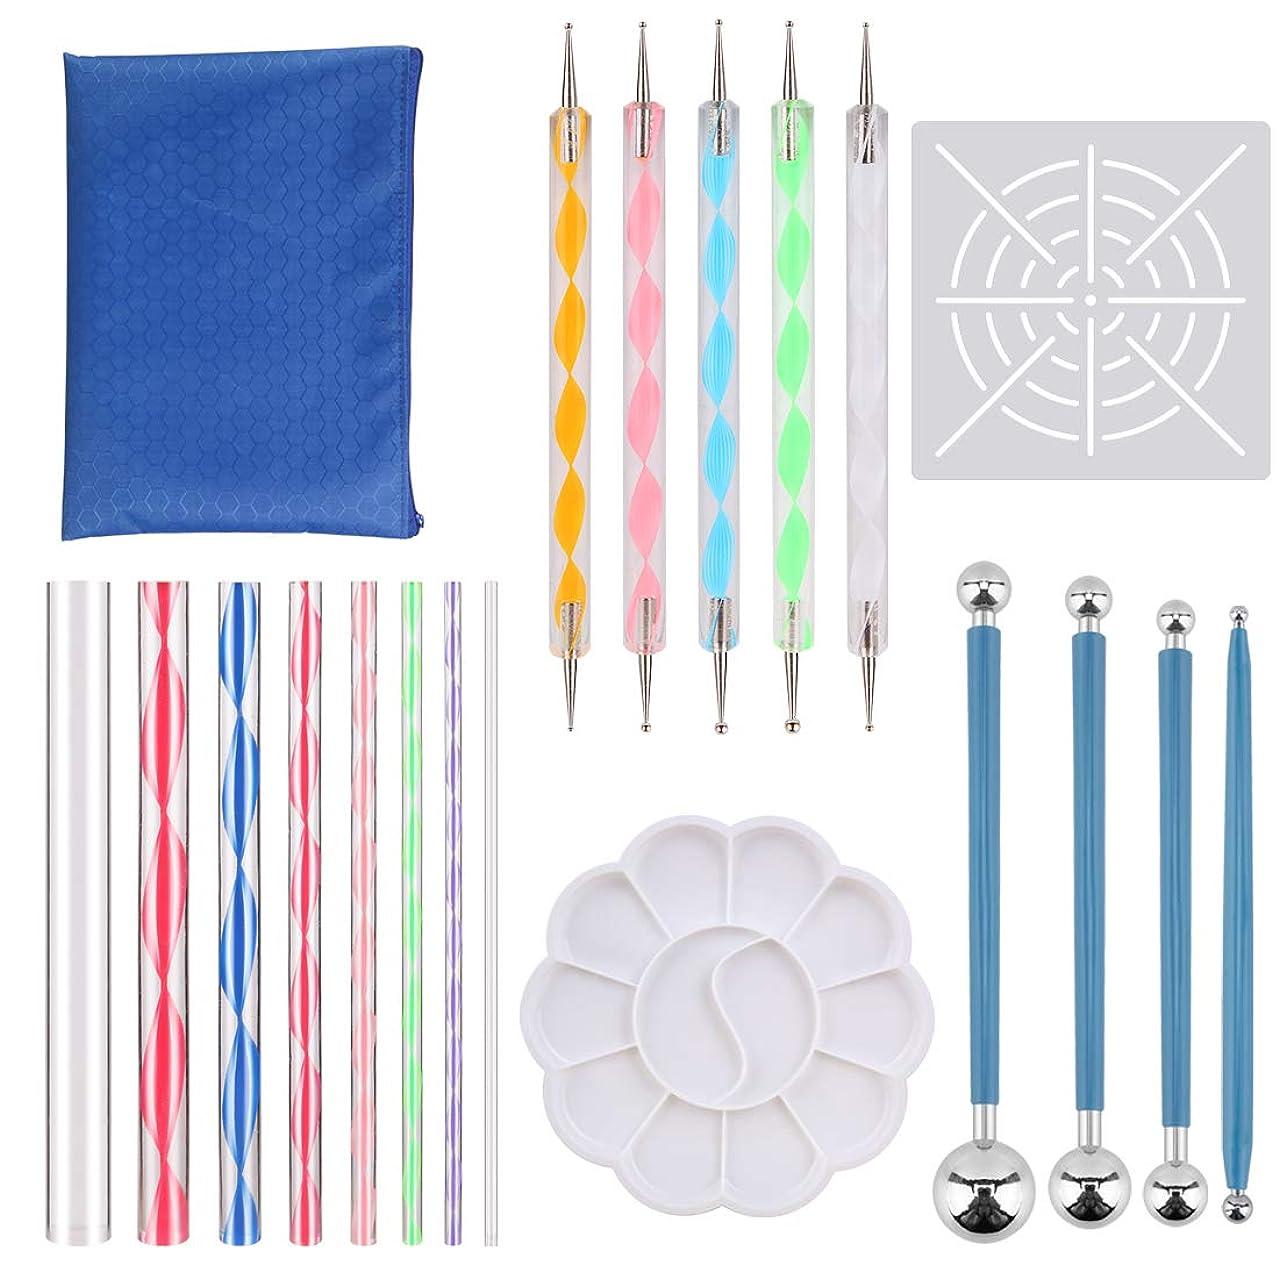 Mandala Dotting Tools, Genround 20 Pcs Dotting Tools Set, 4 Blue Rubber Handle Ball Stylus, 5 Color Handle Dotting Tools, 8 Acrylic Rod, Mandala Stencil, Paint Tray and Storage Bag